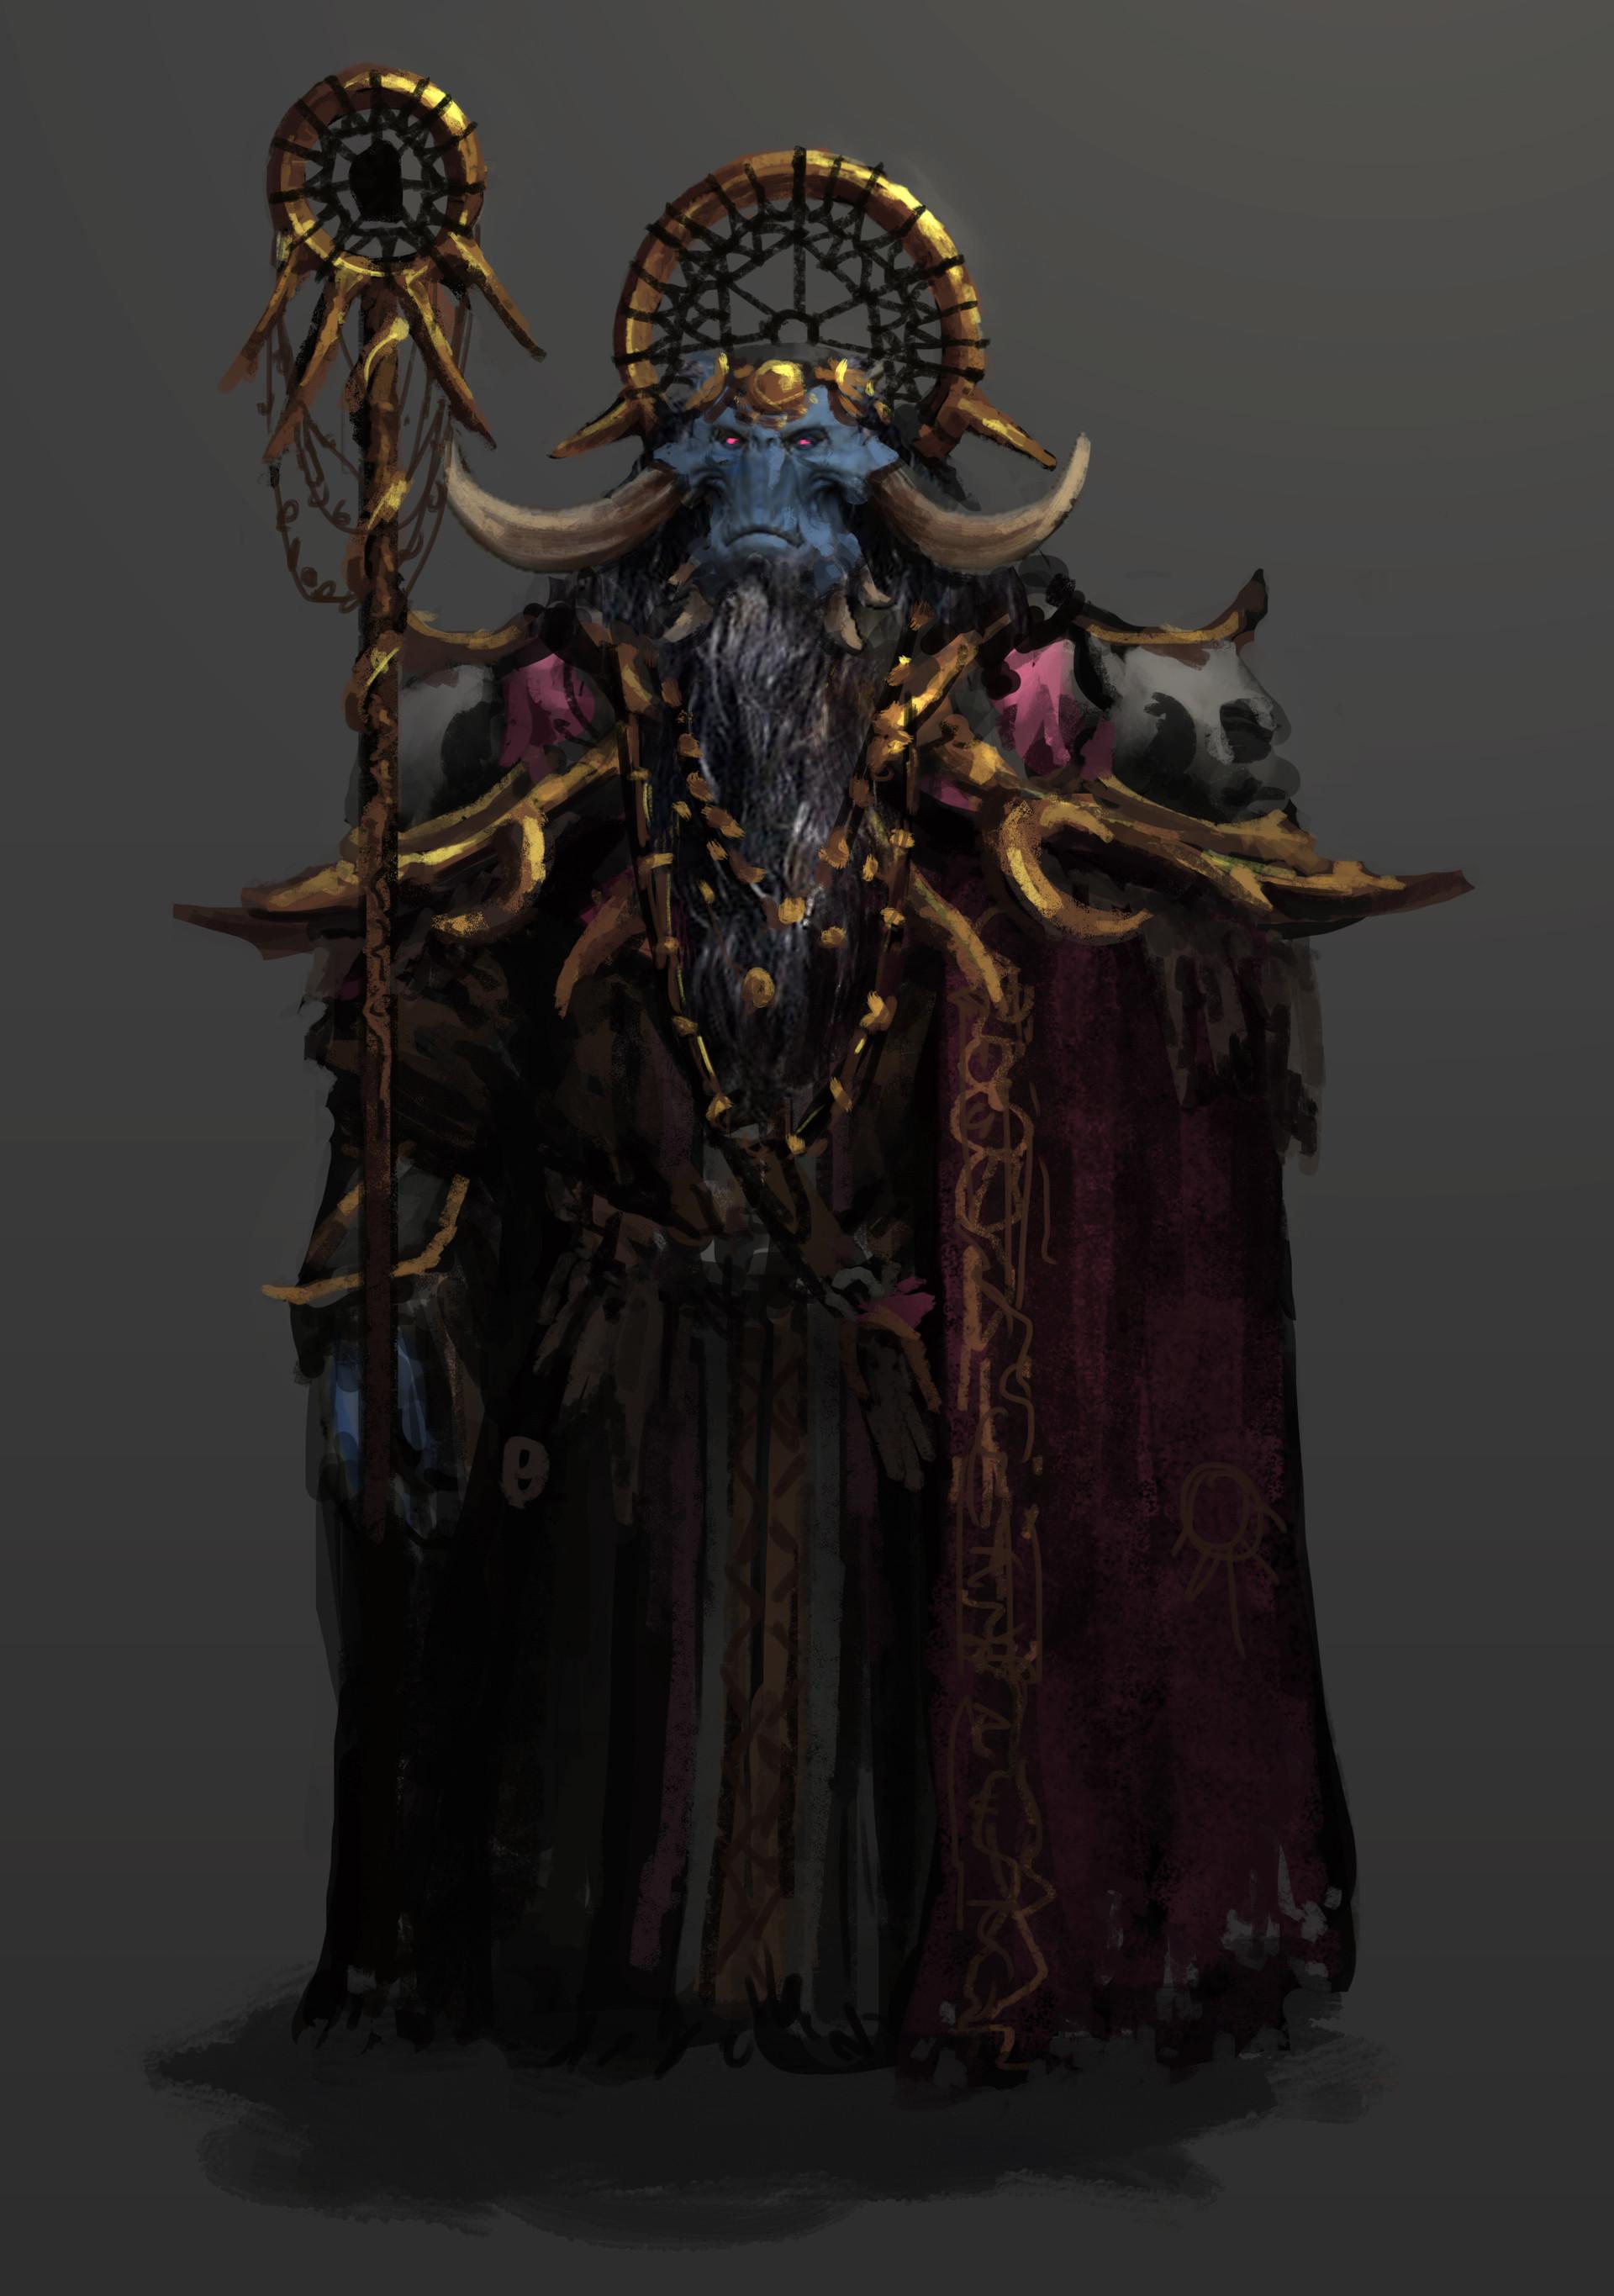 Lucas orstrom orc archpriest 01